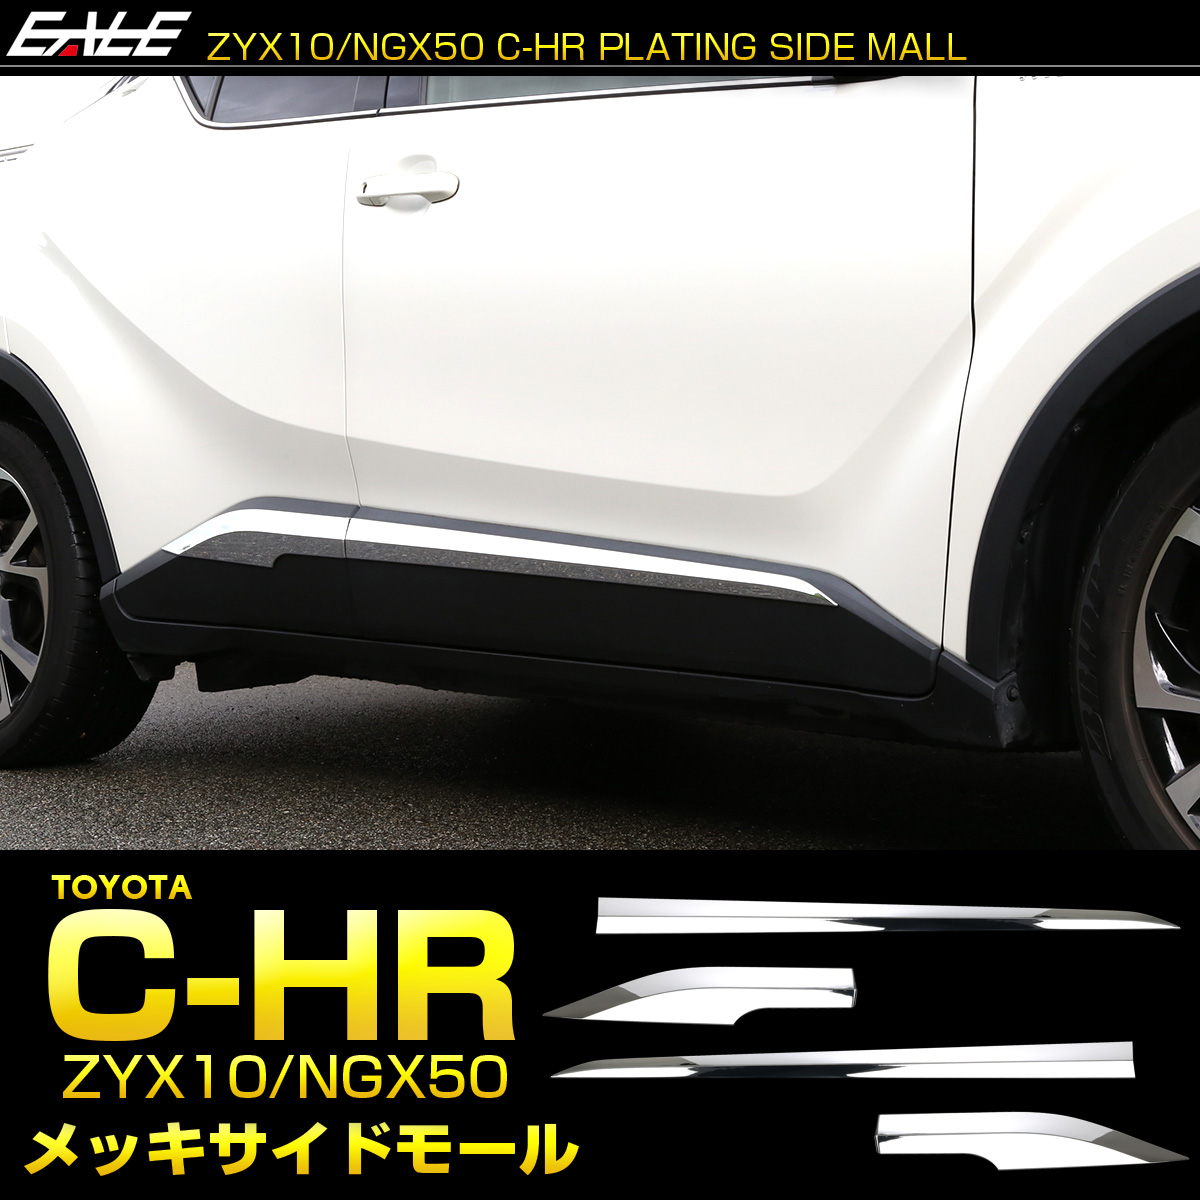 C-HR メッキ サイドモール ZYX10 NGX50 メッキパーツ ドア メッキガーニッシュ LB0012